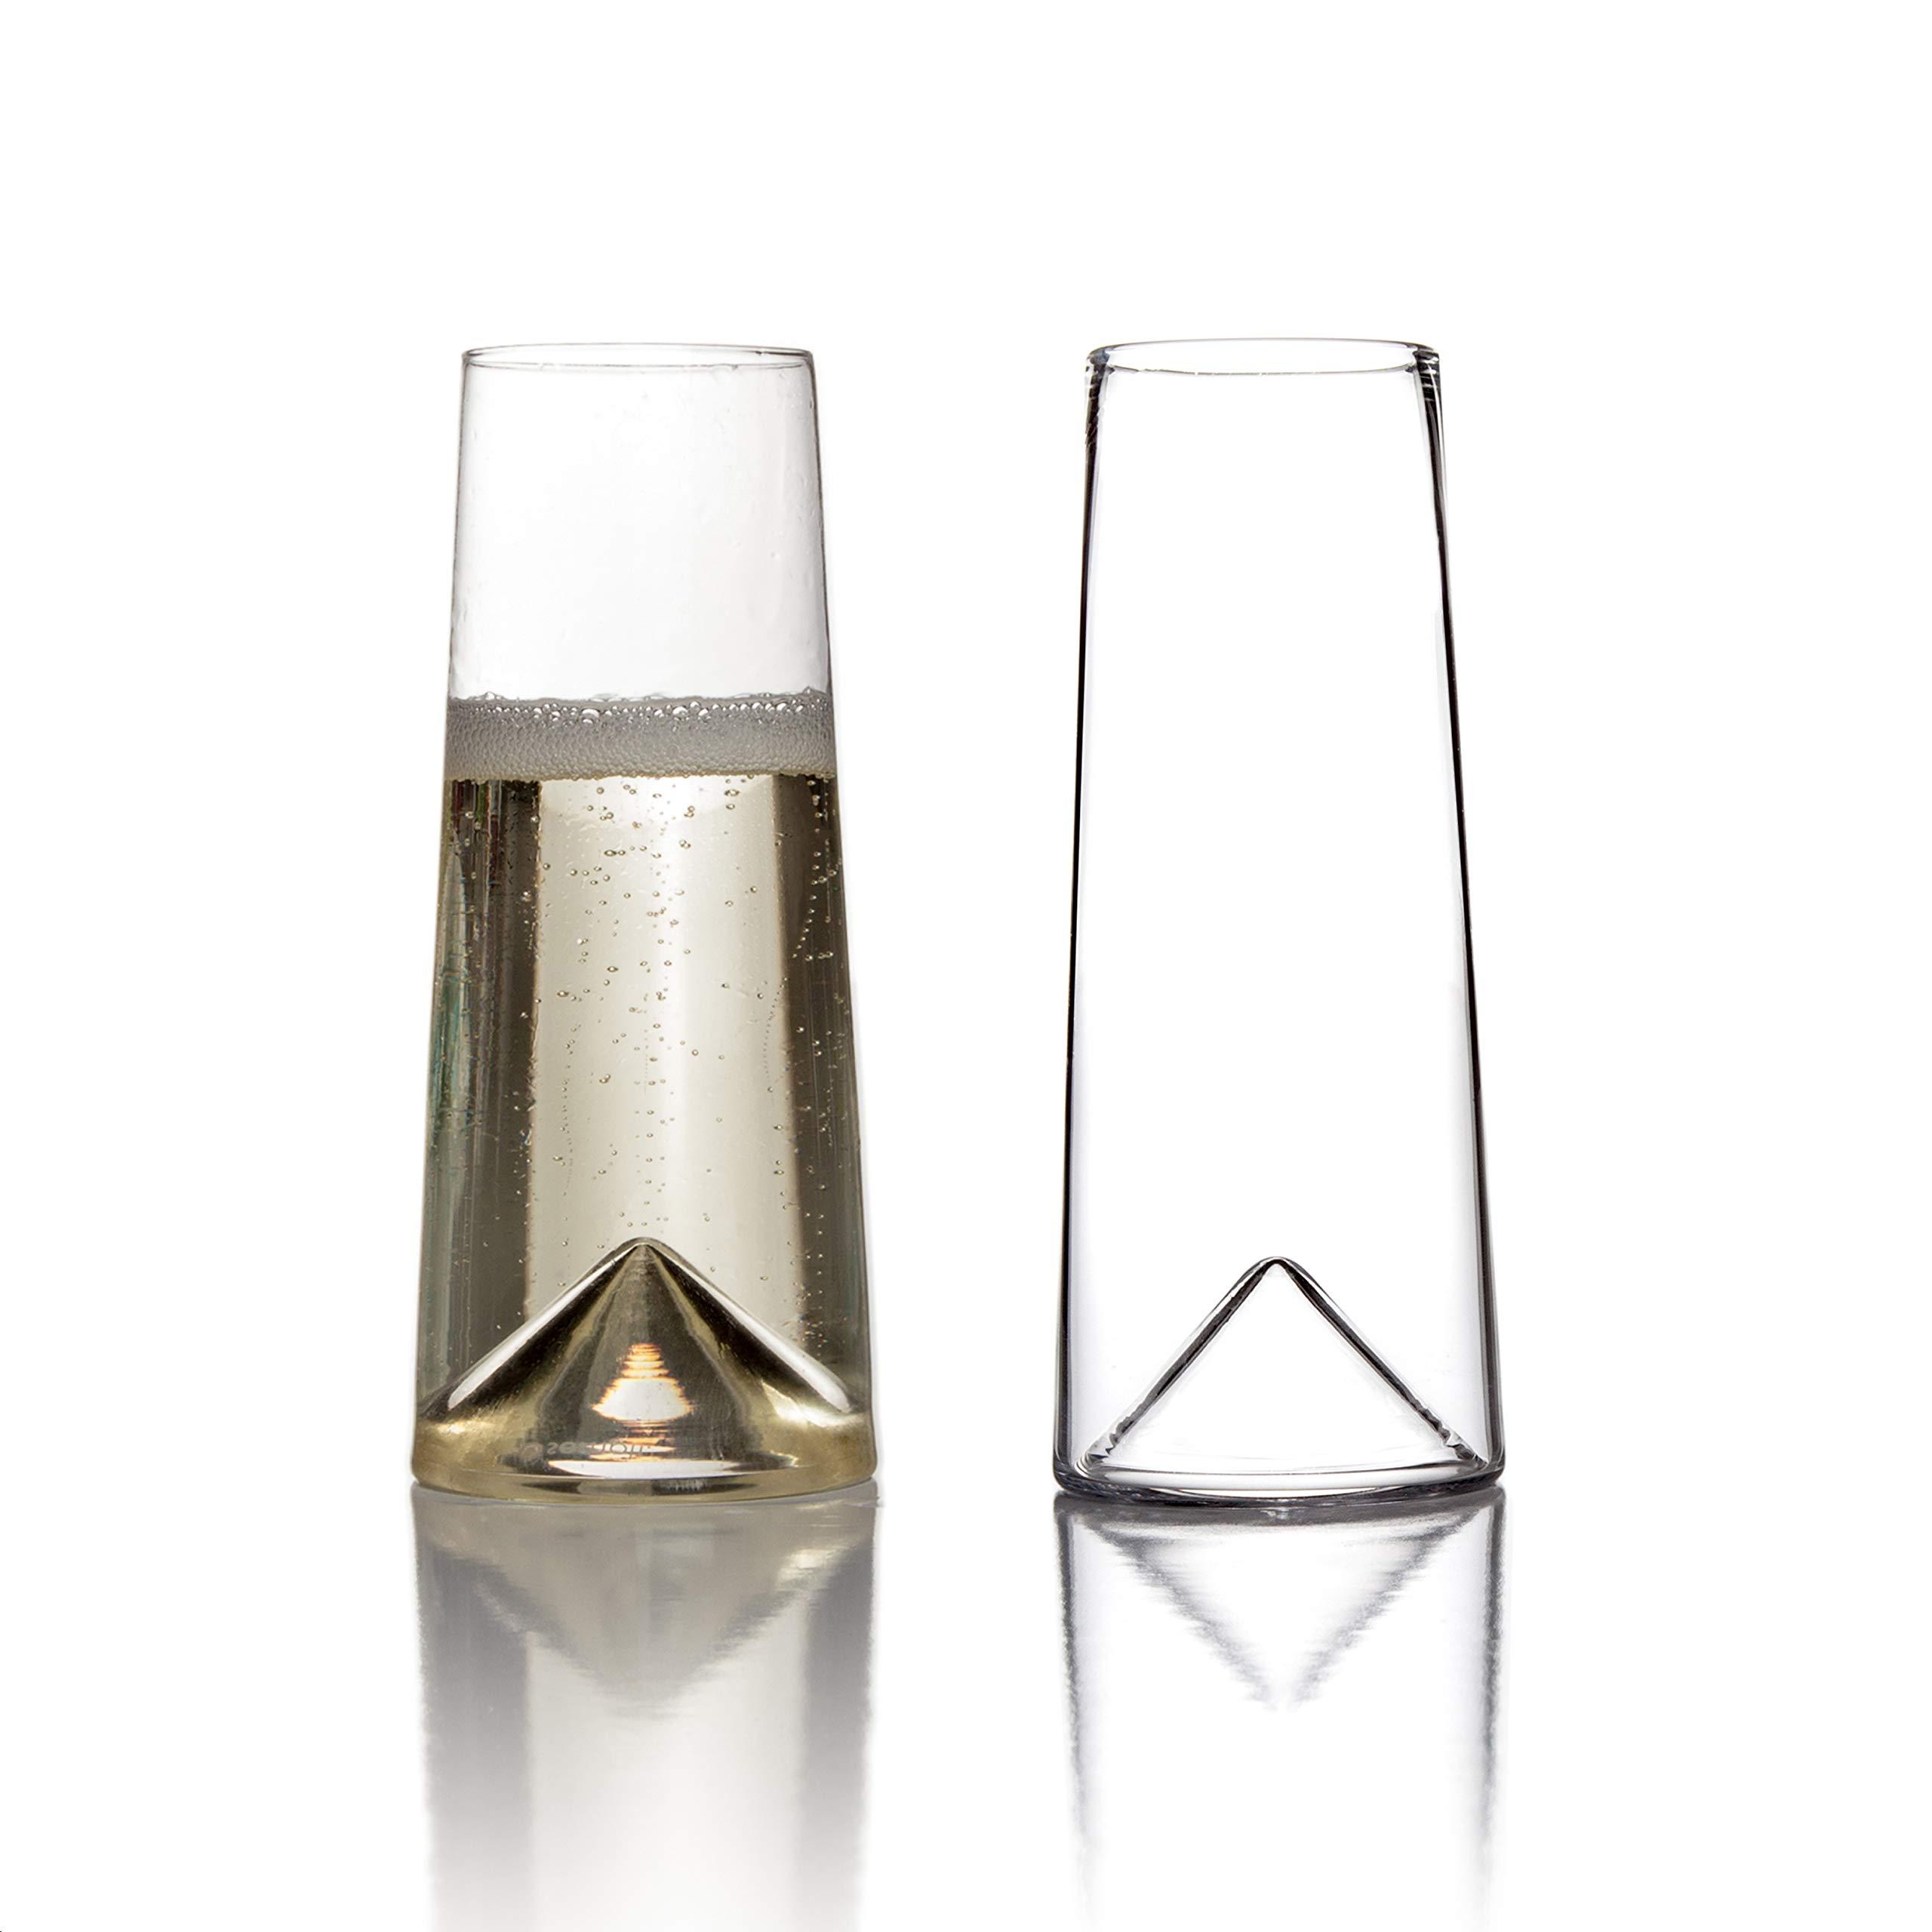 Sempli Monti-Flute, Clear Champagne Glasses Set of 2 in Gift-box